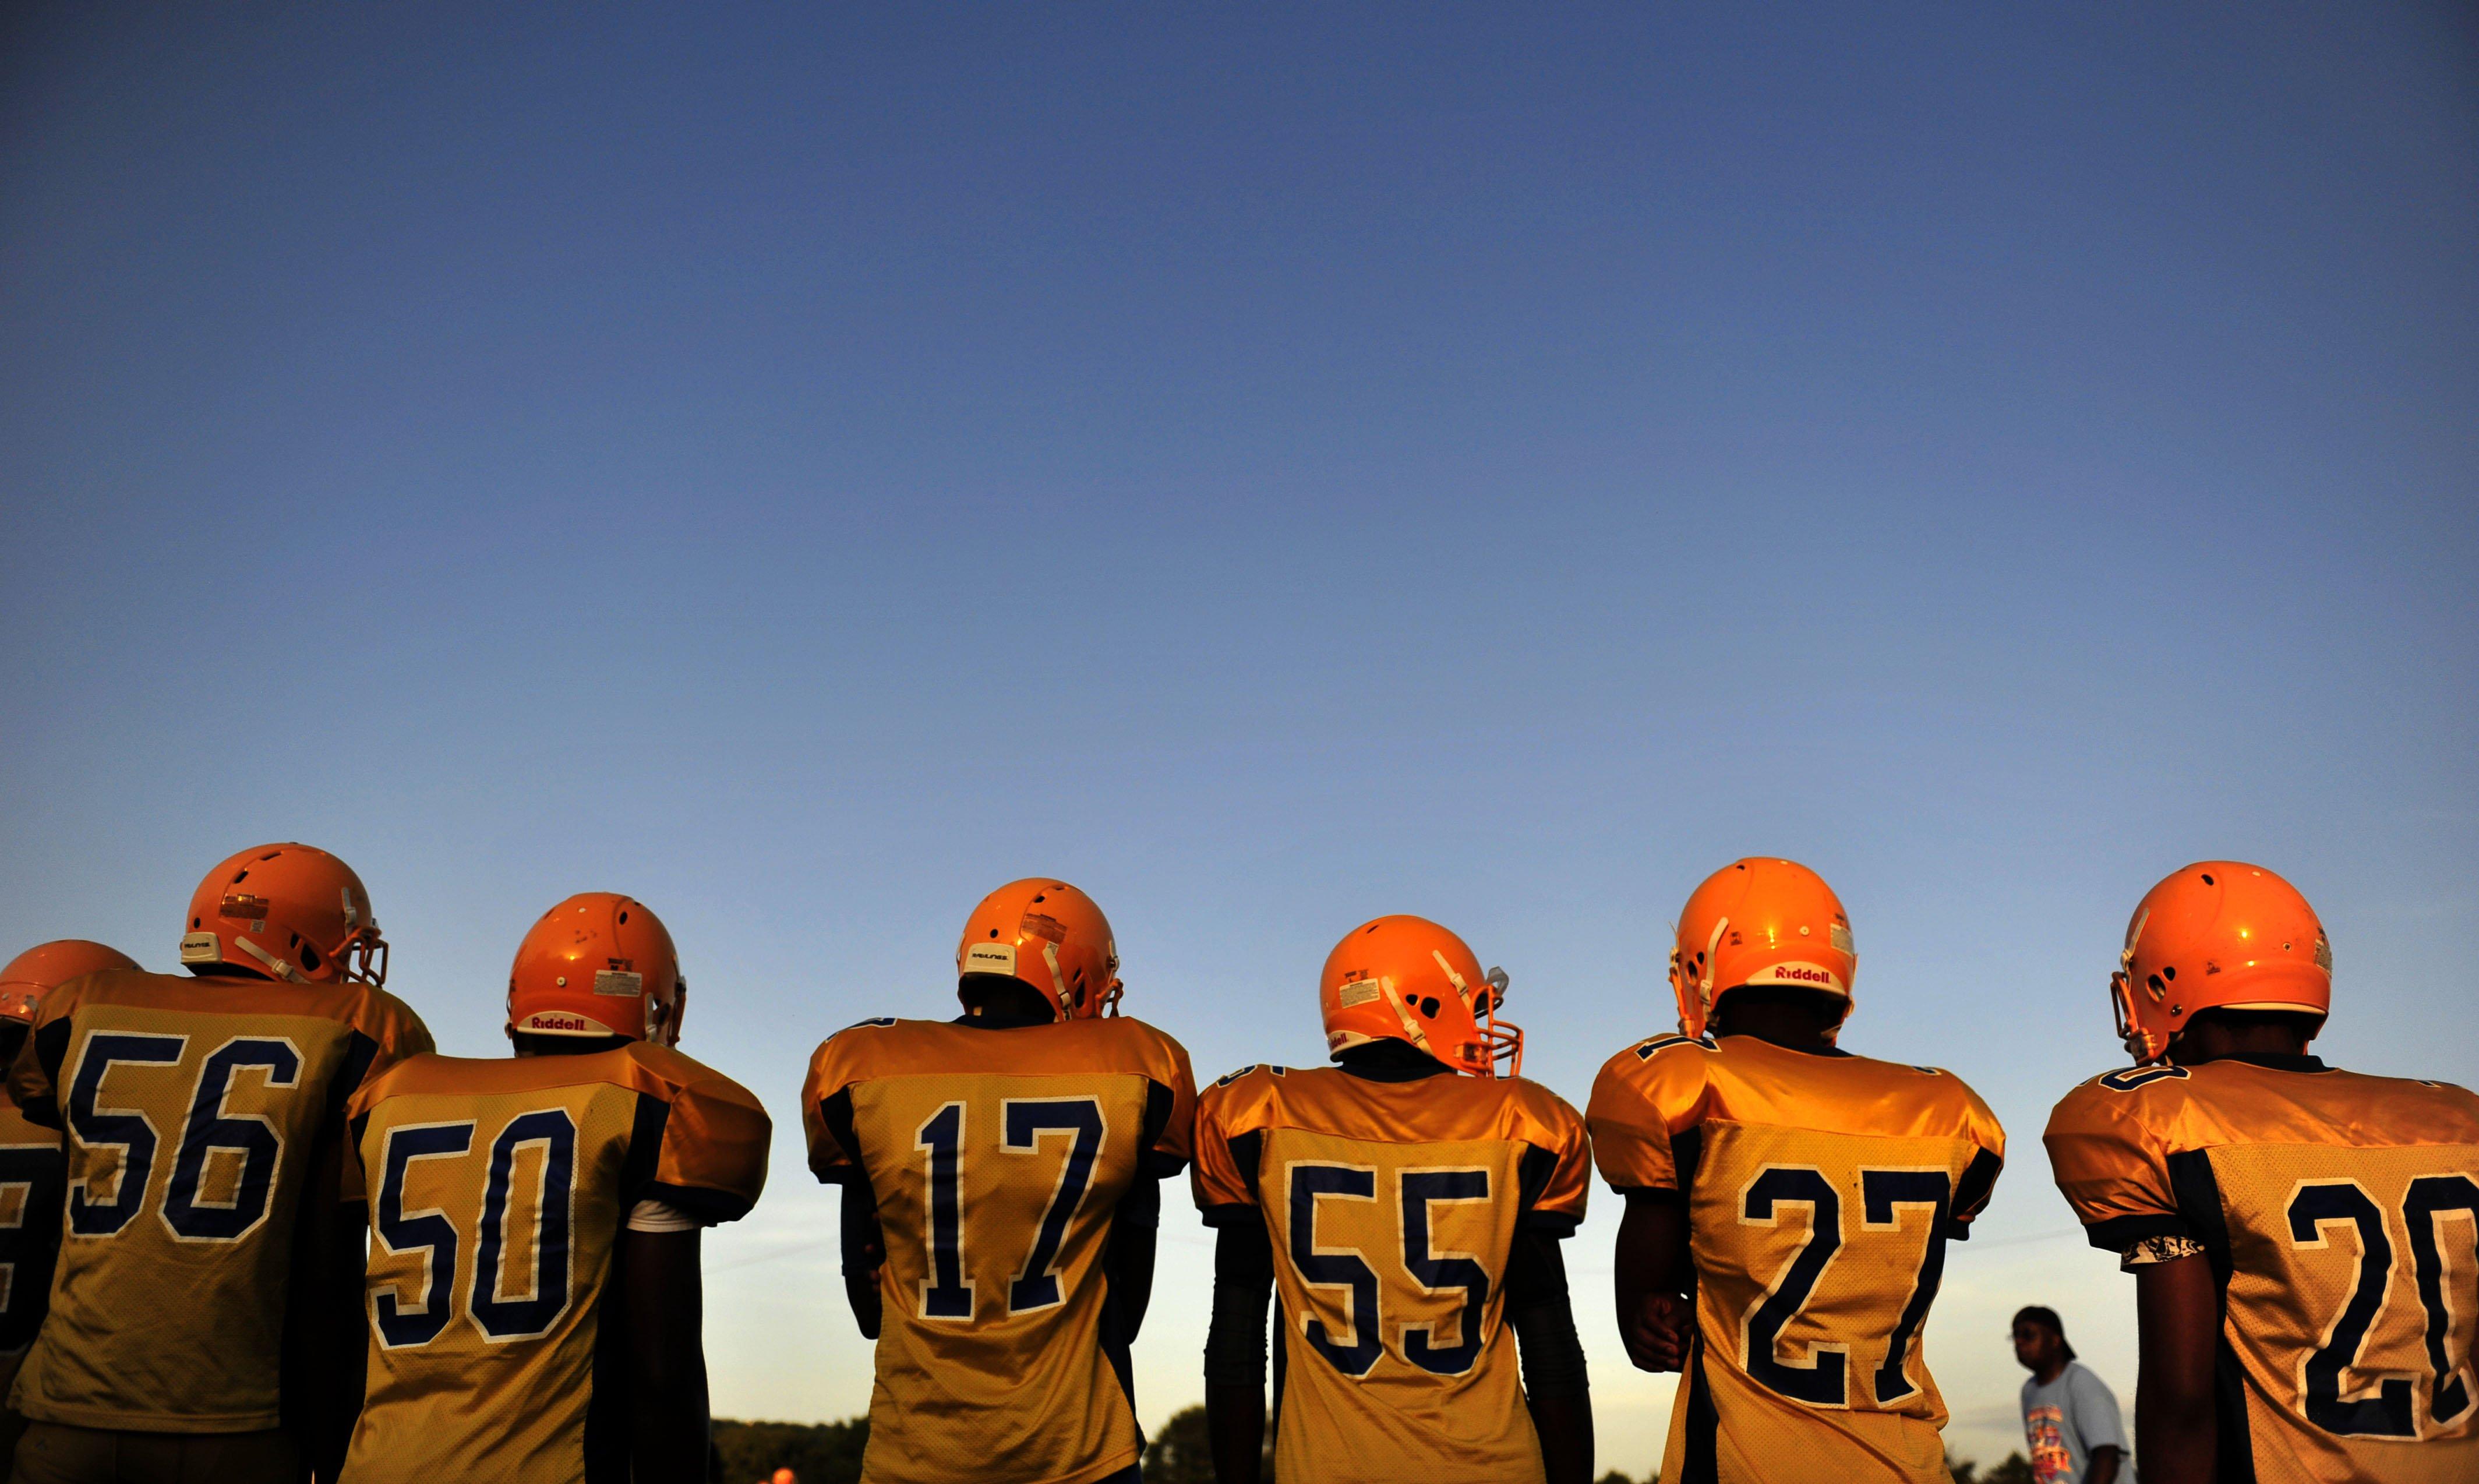 J.O. Johnson Jaguar football practice at Johnson High School on Aug. 21, 2014 in Huntsville, Ala.